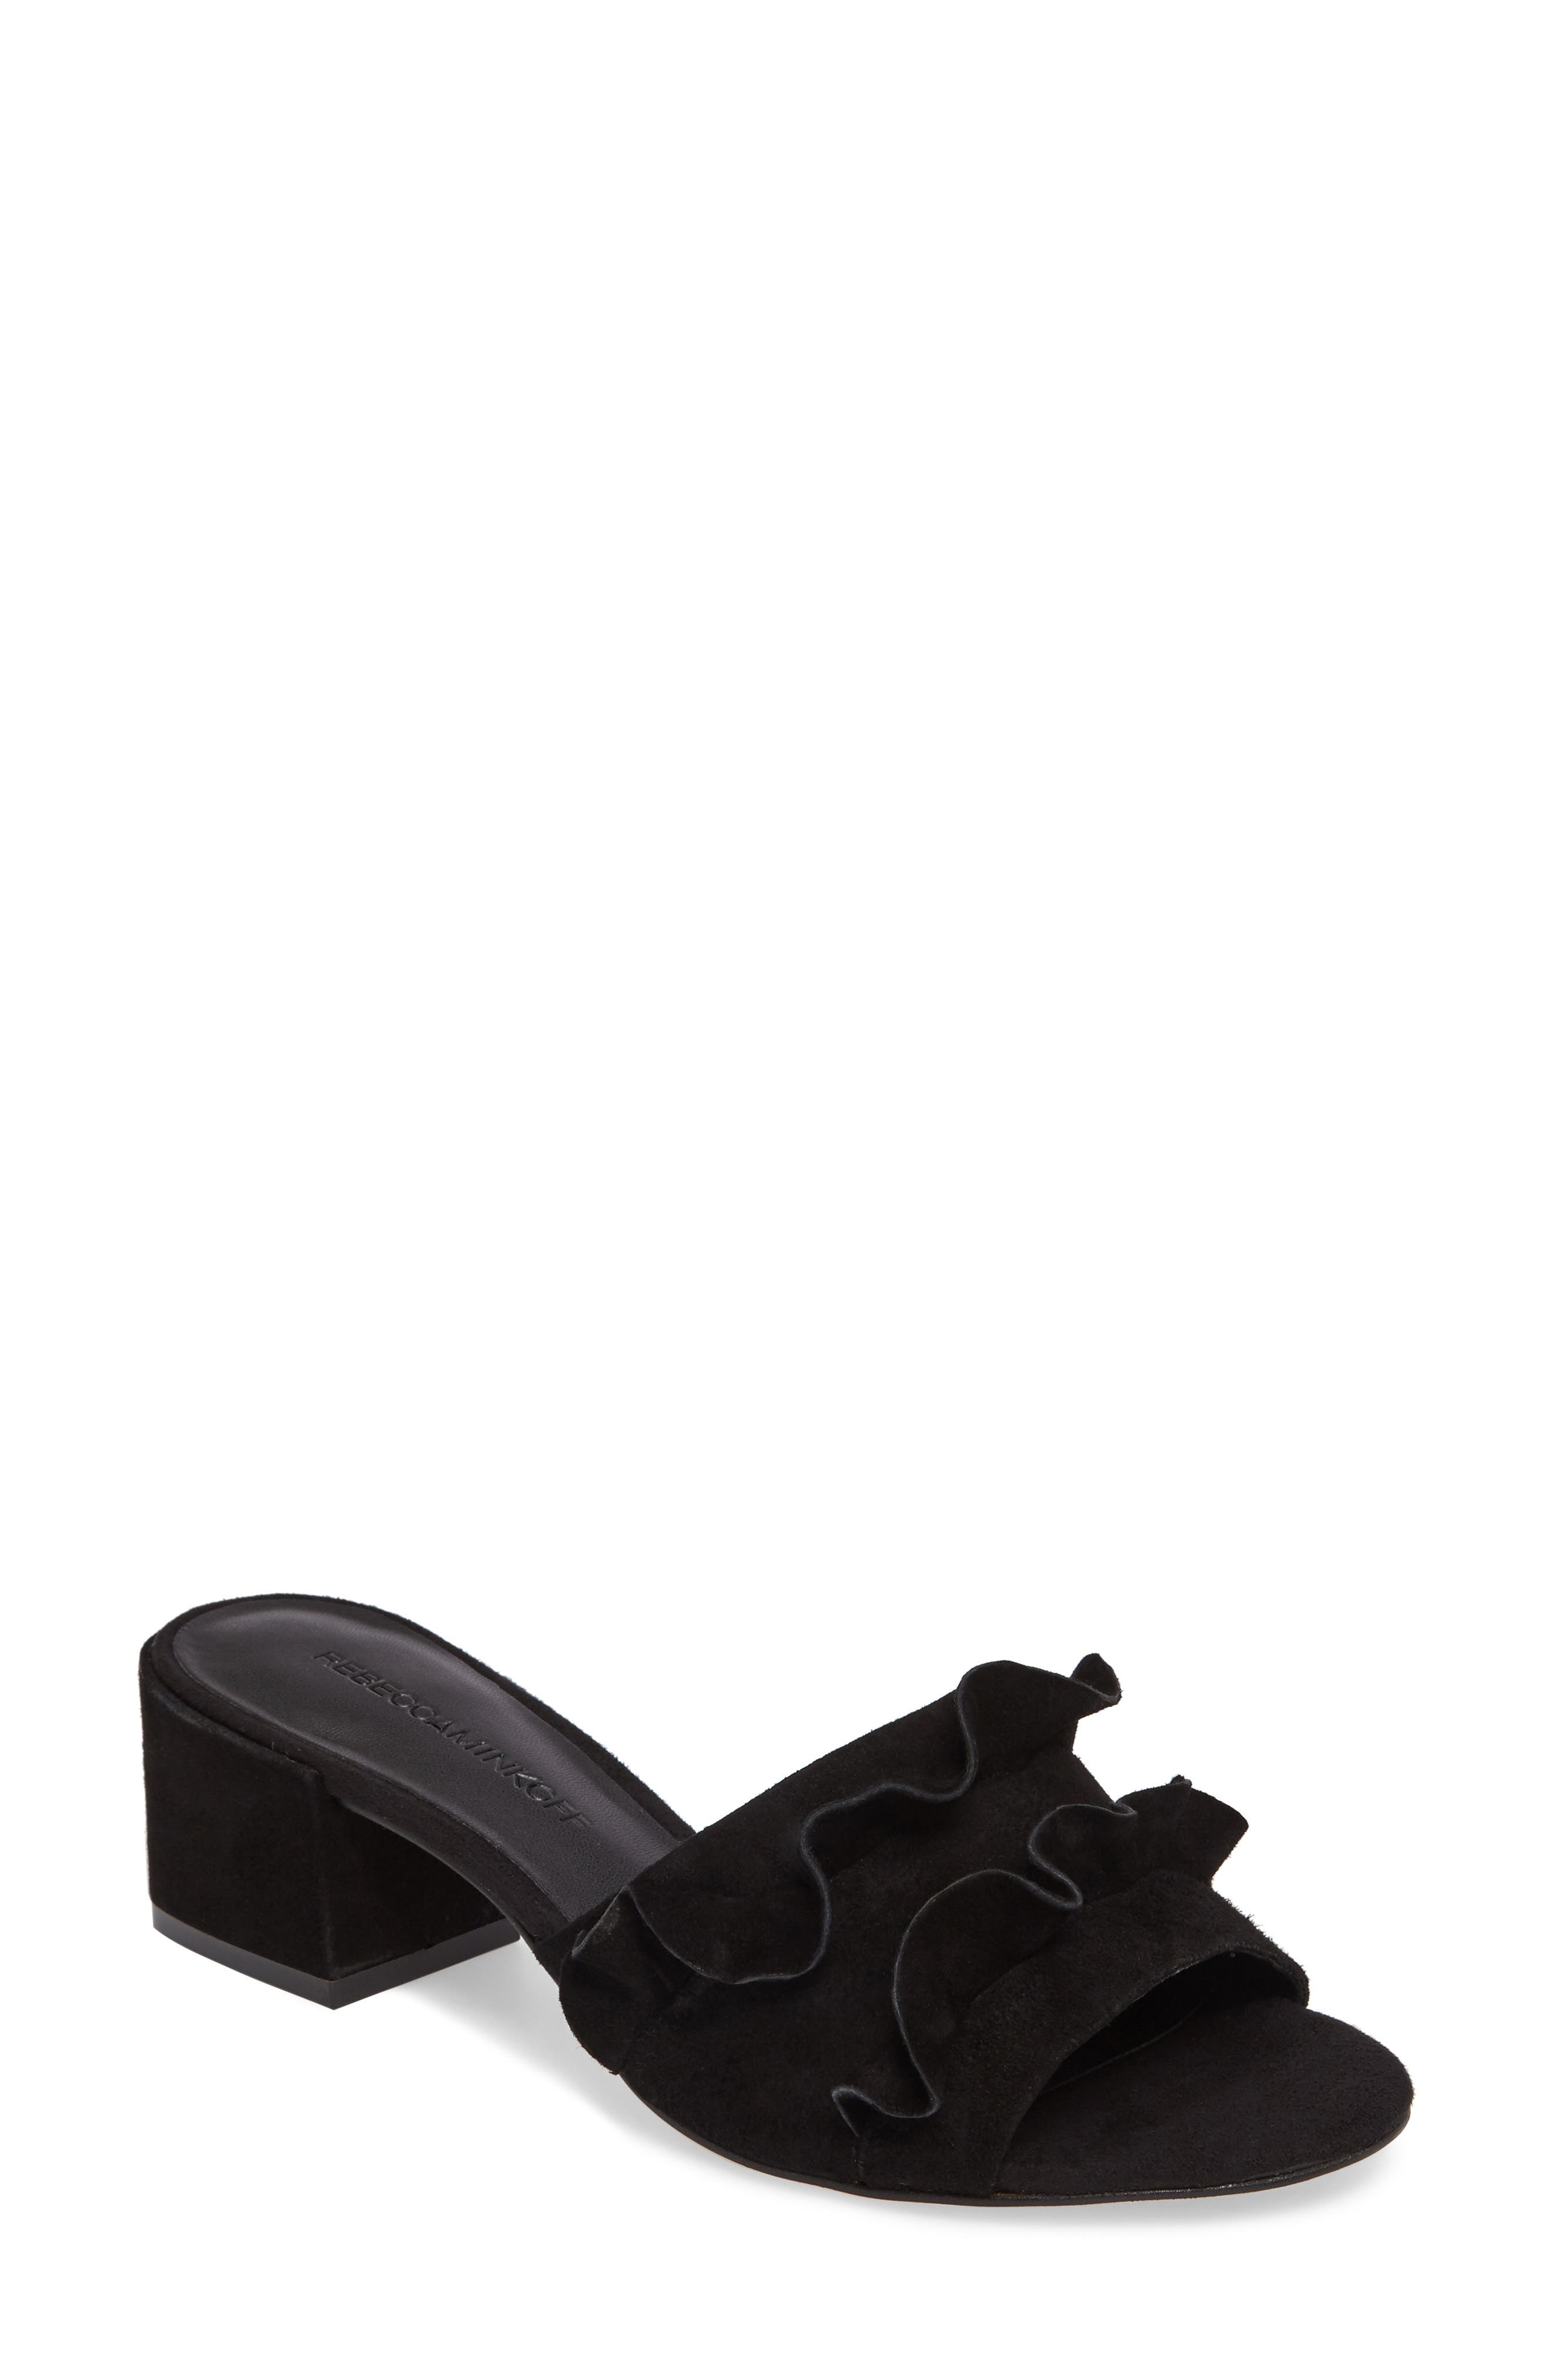 Isabelle Ruffle Mule Sandal,                         Main,                         color, 004